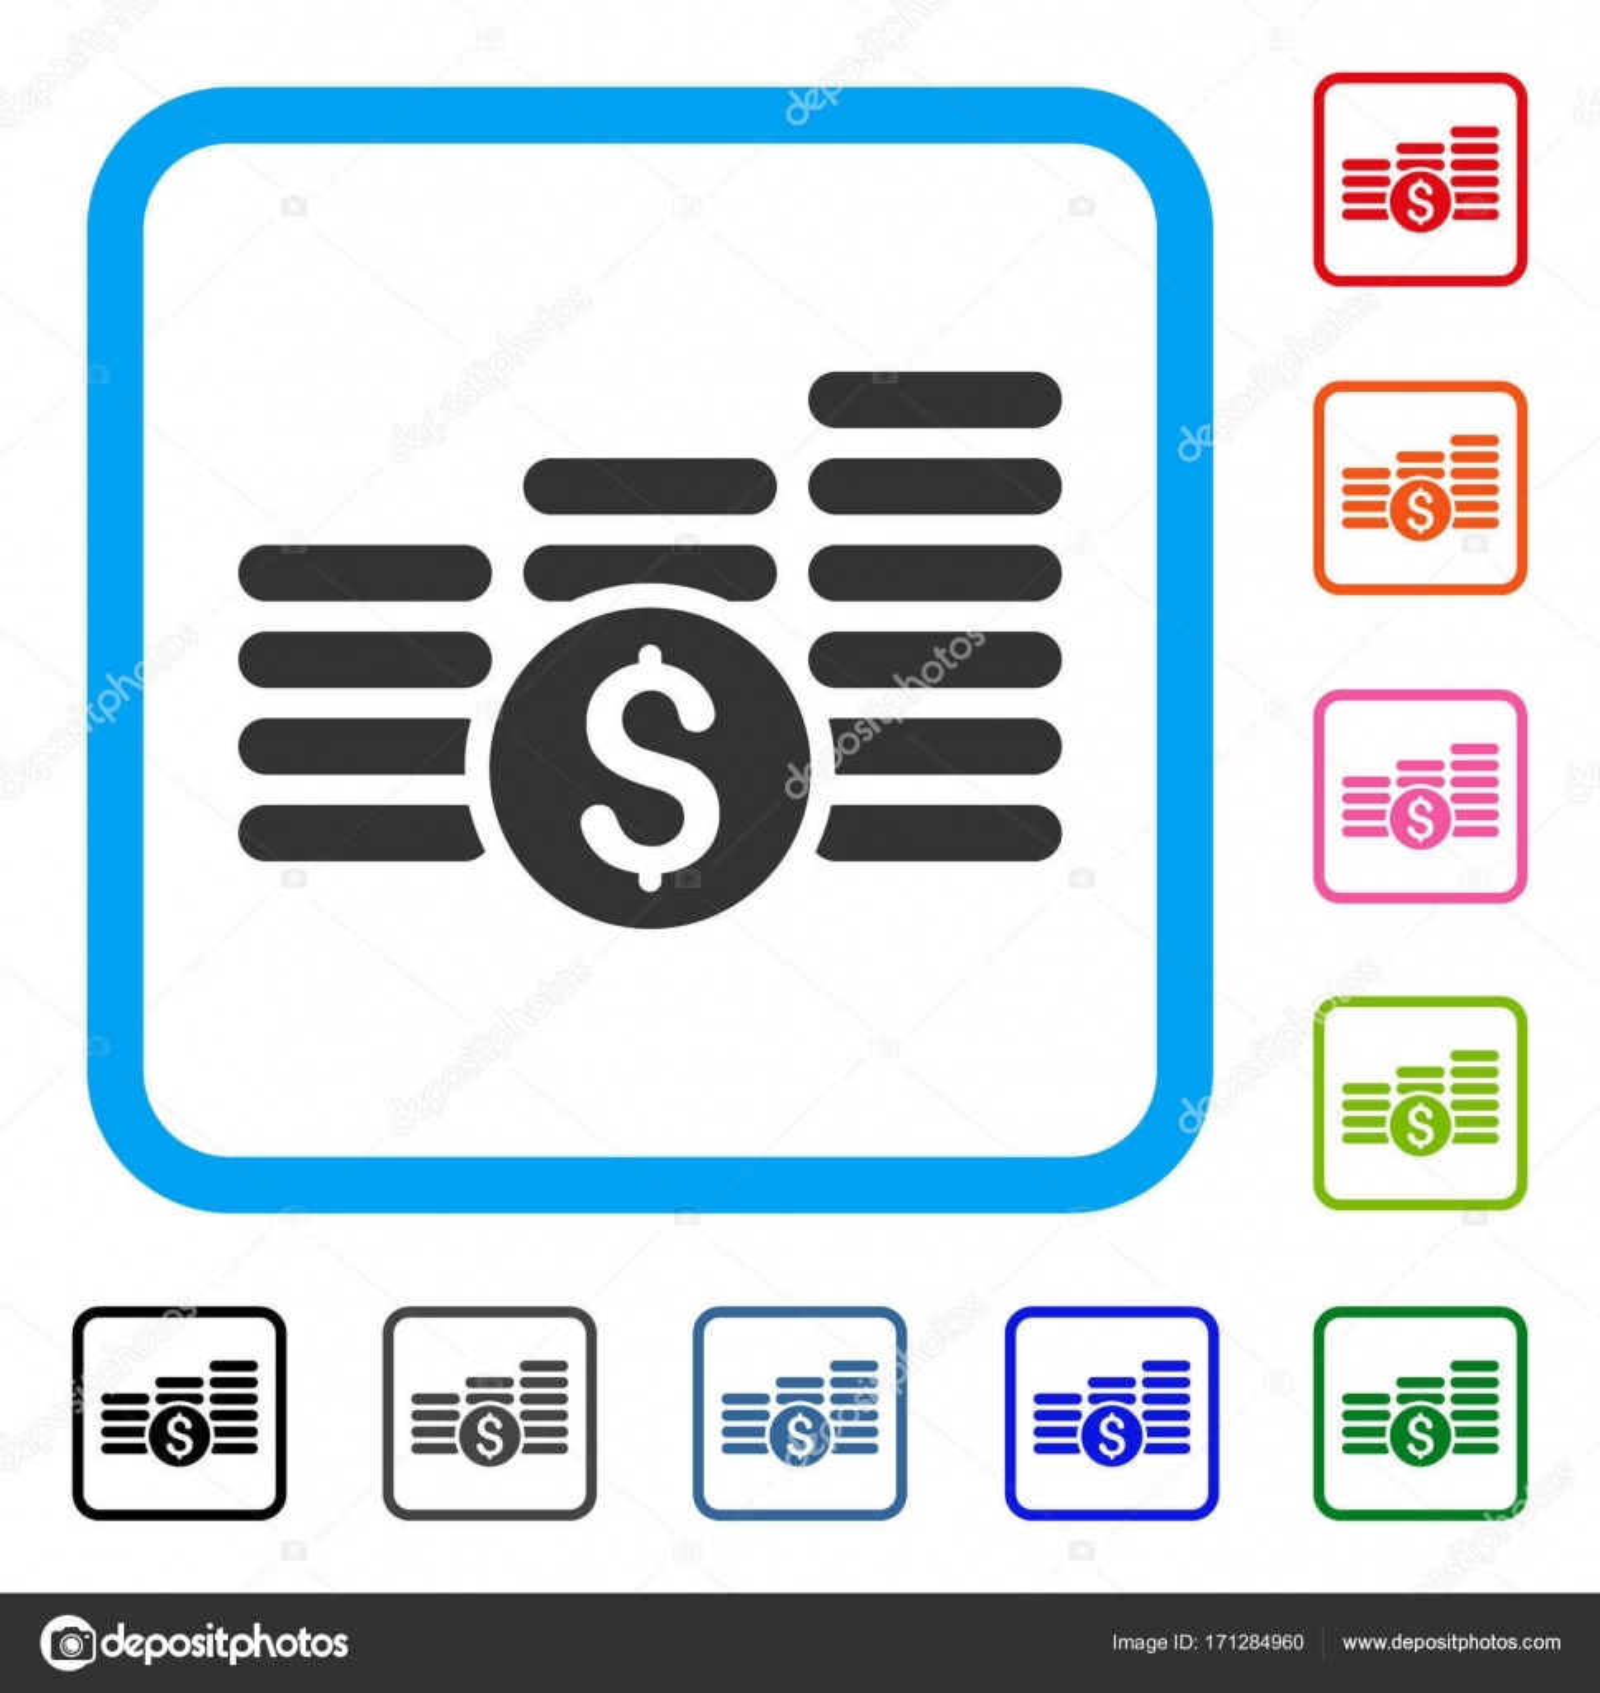 depositphotos_171284960-stock-illustration-finances-framed-icon.jpg